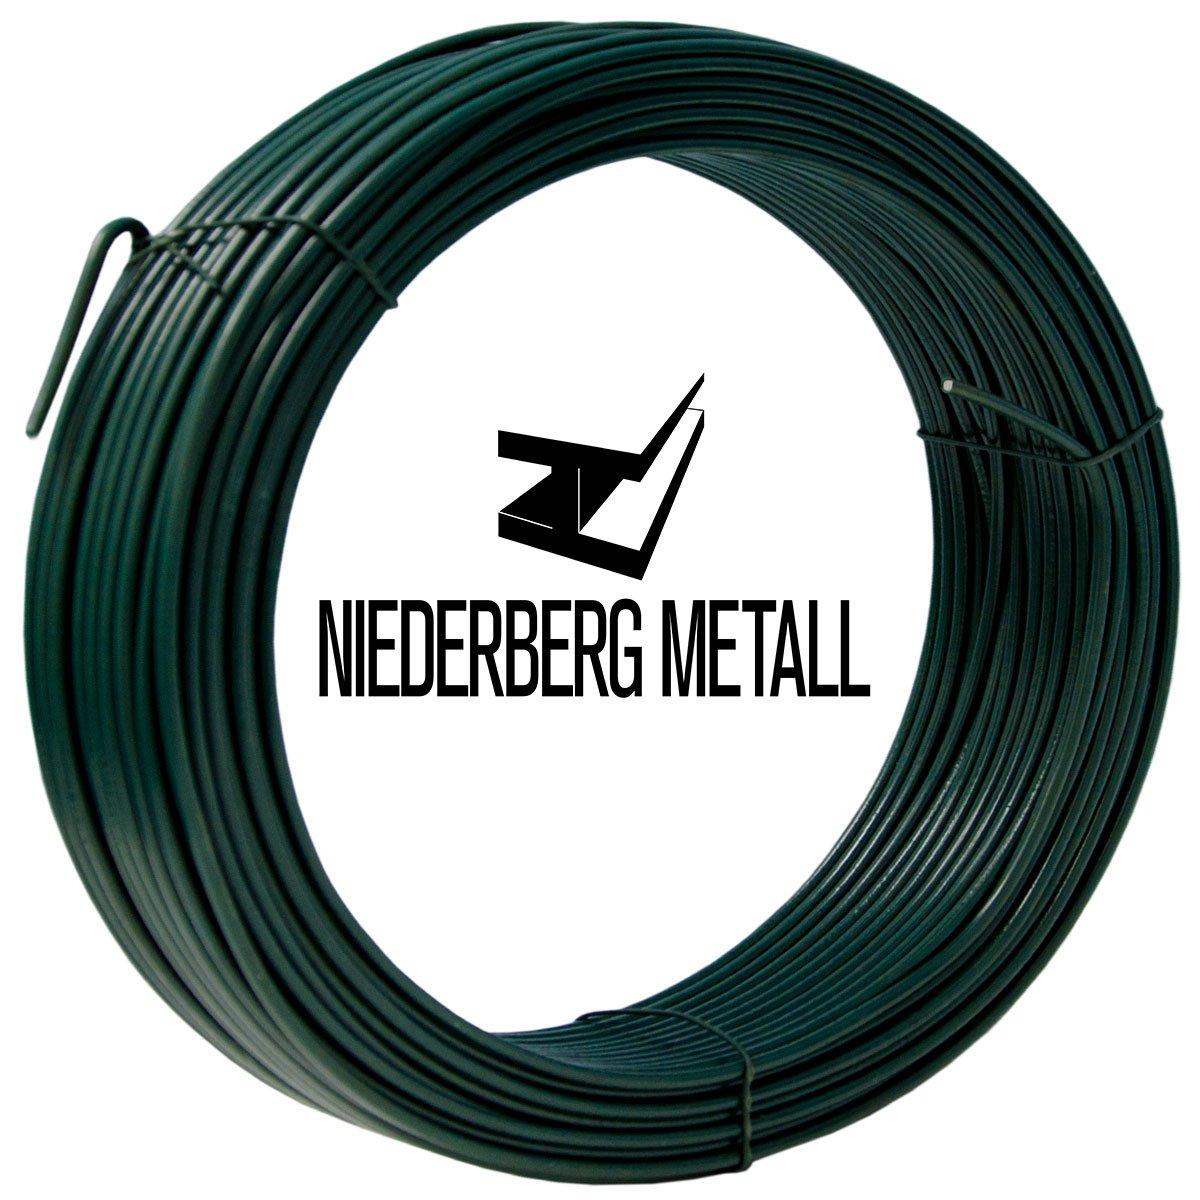 NIEDERBERG METALL 25m Bindedraht Spanndraht Ø 2,0mm Basteldraht ...